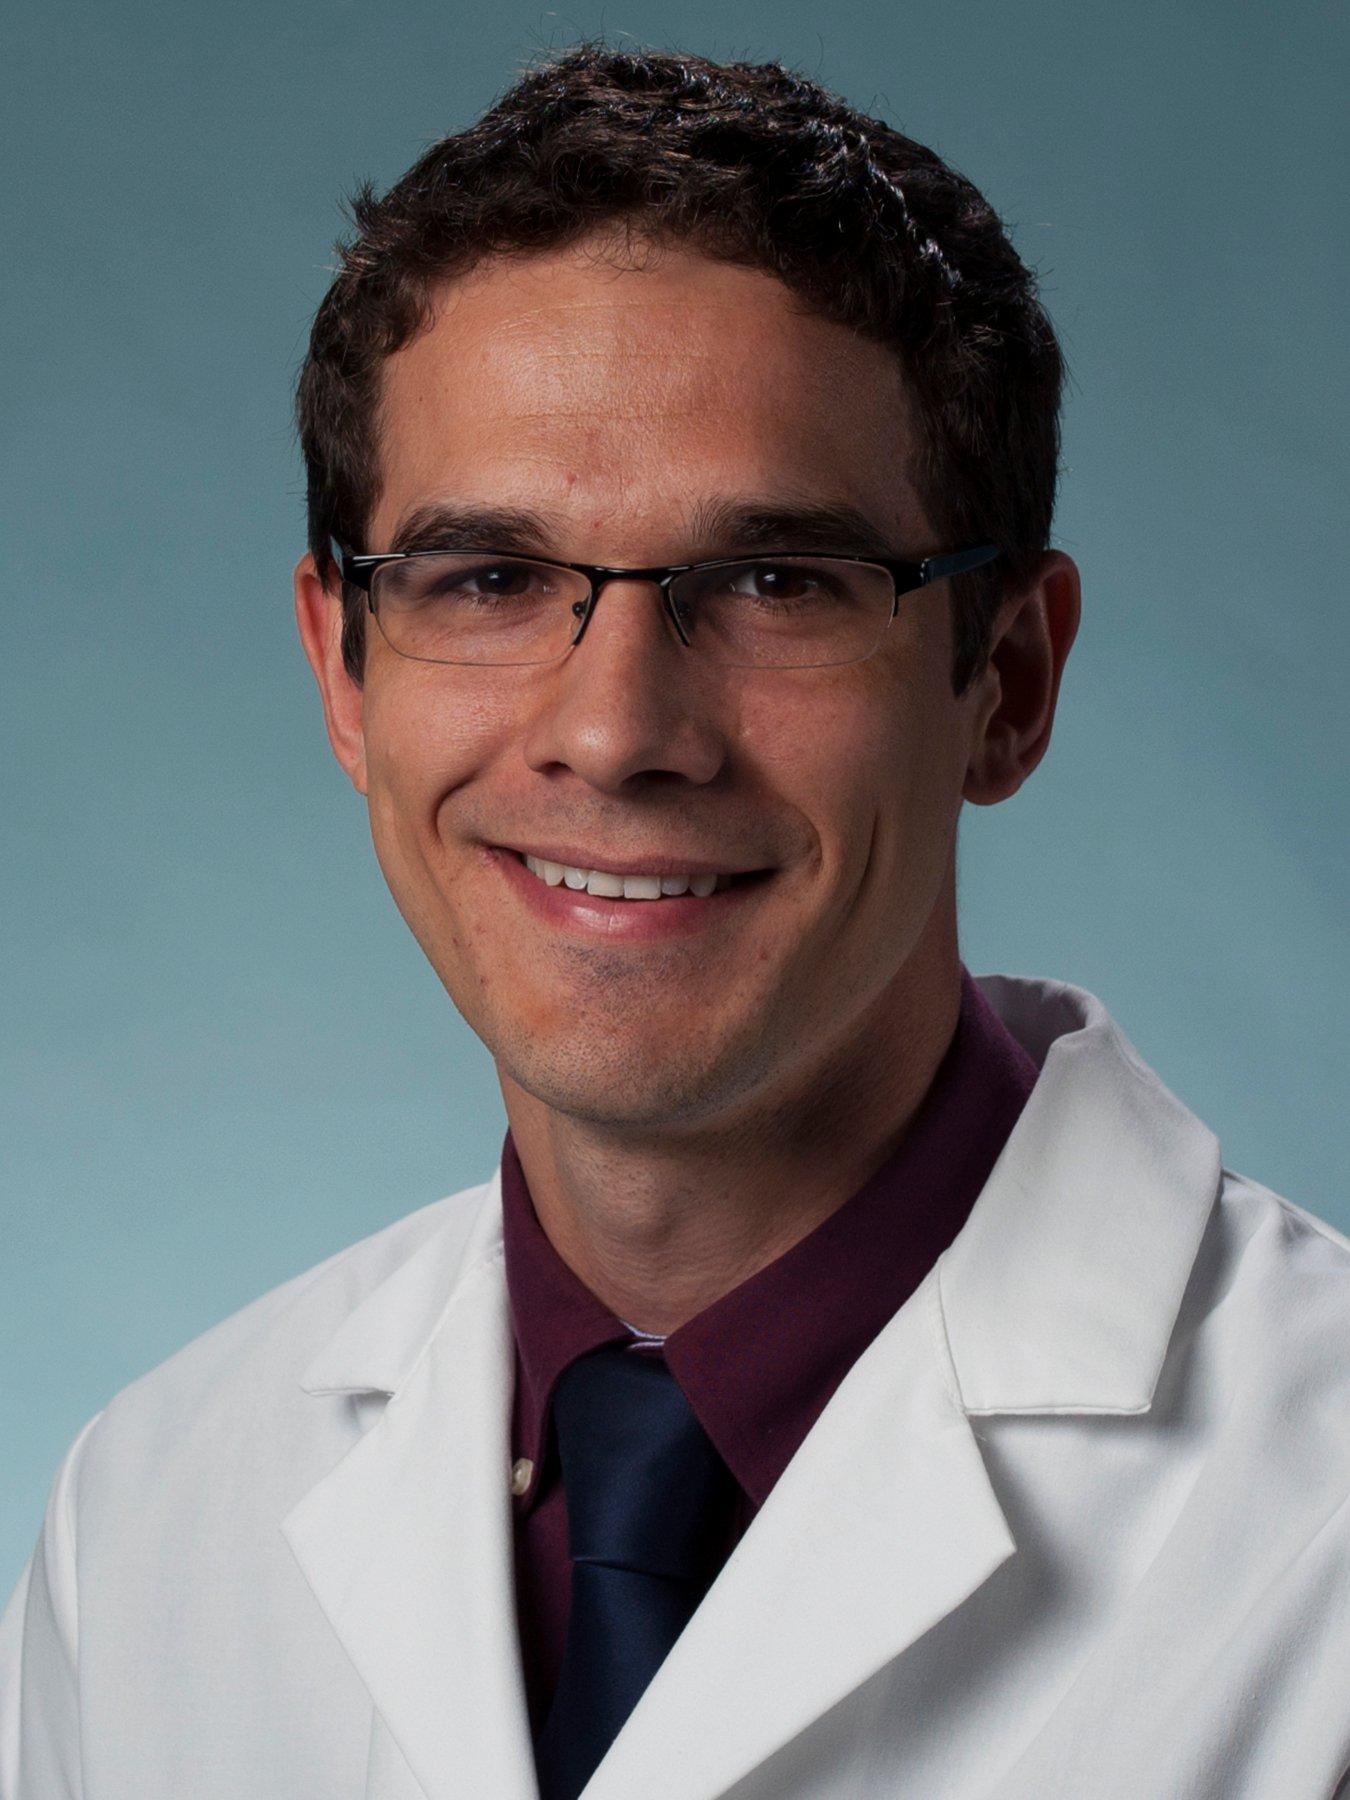 Matthew Buttarazzi, MD